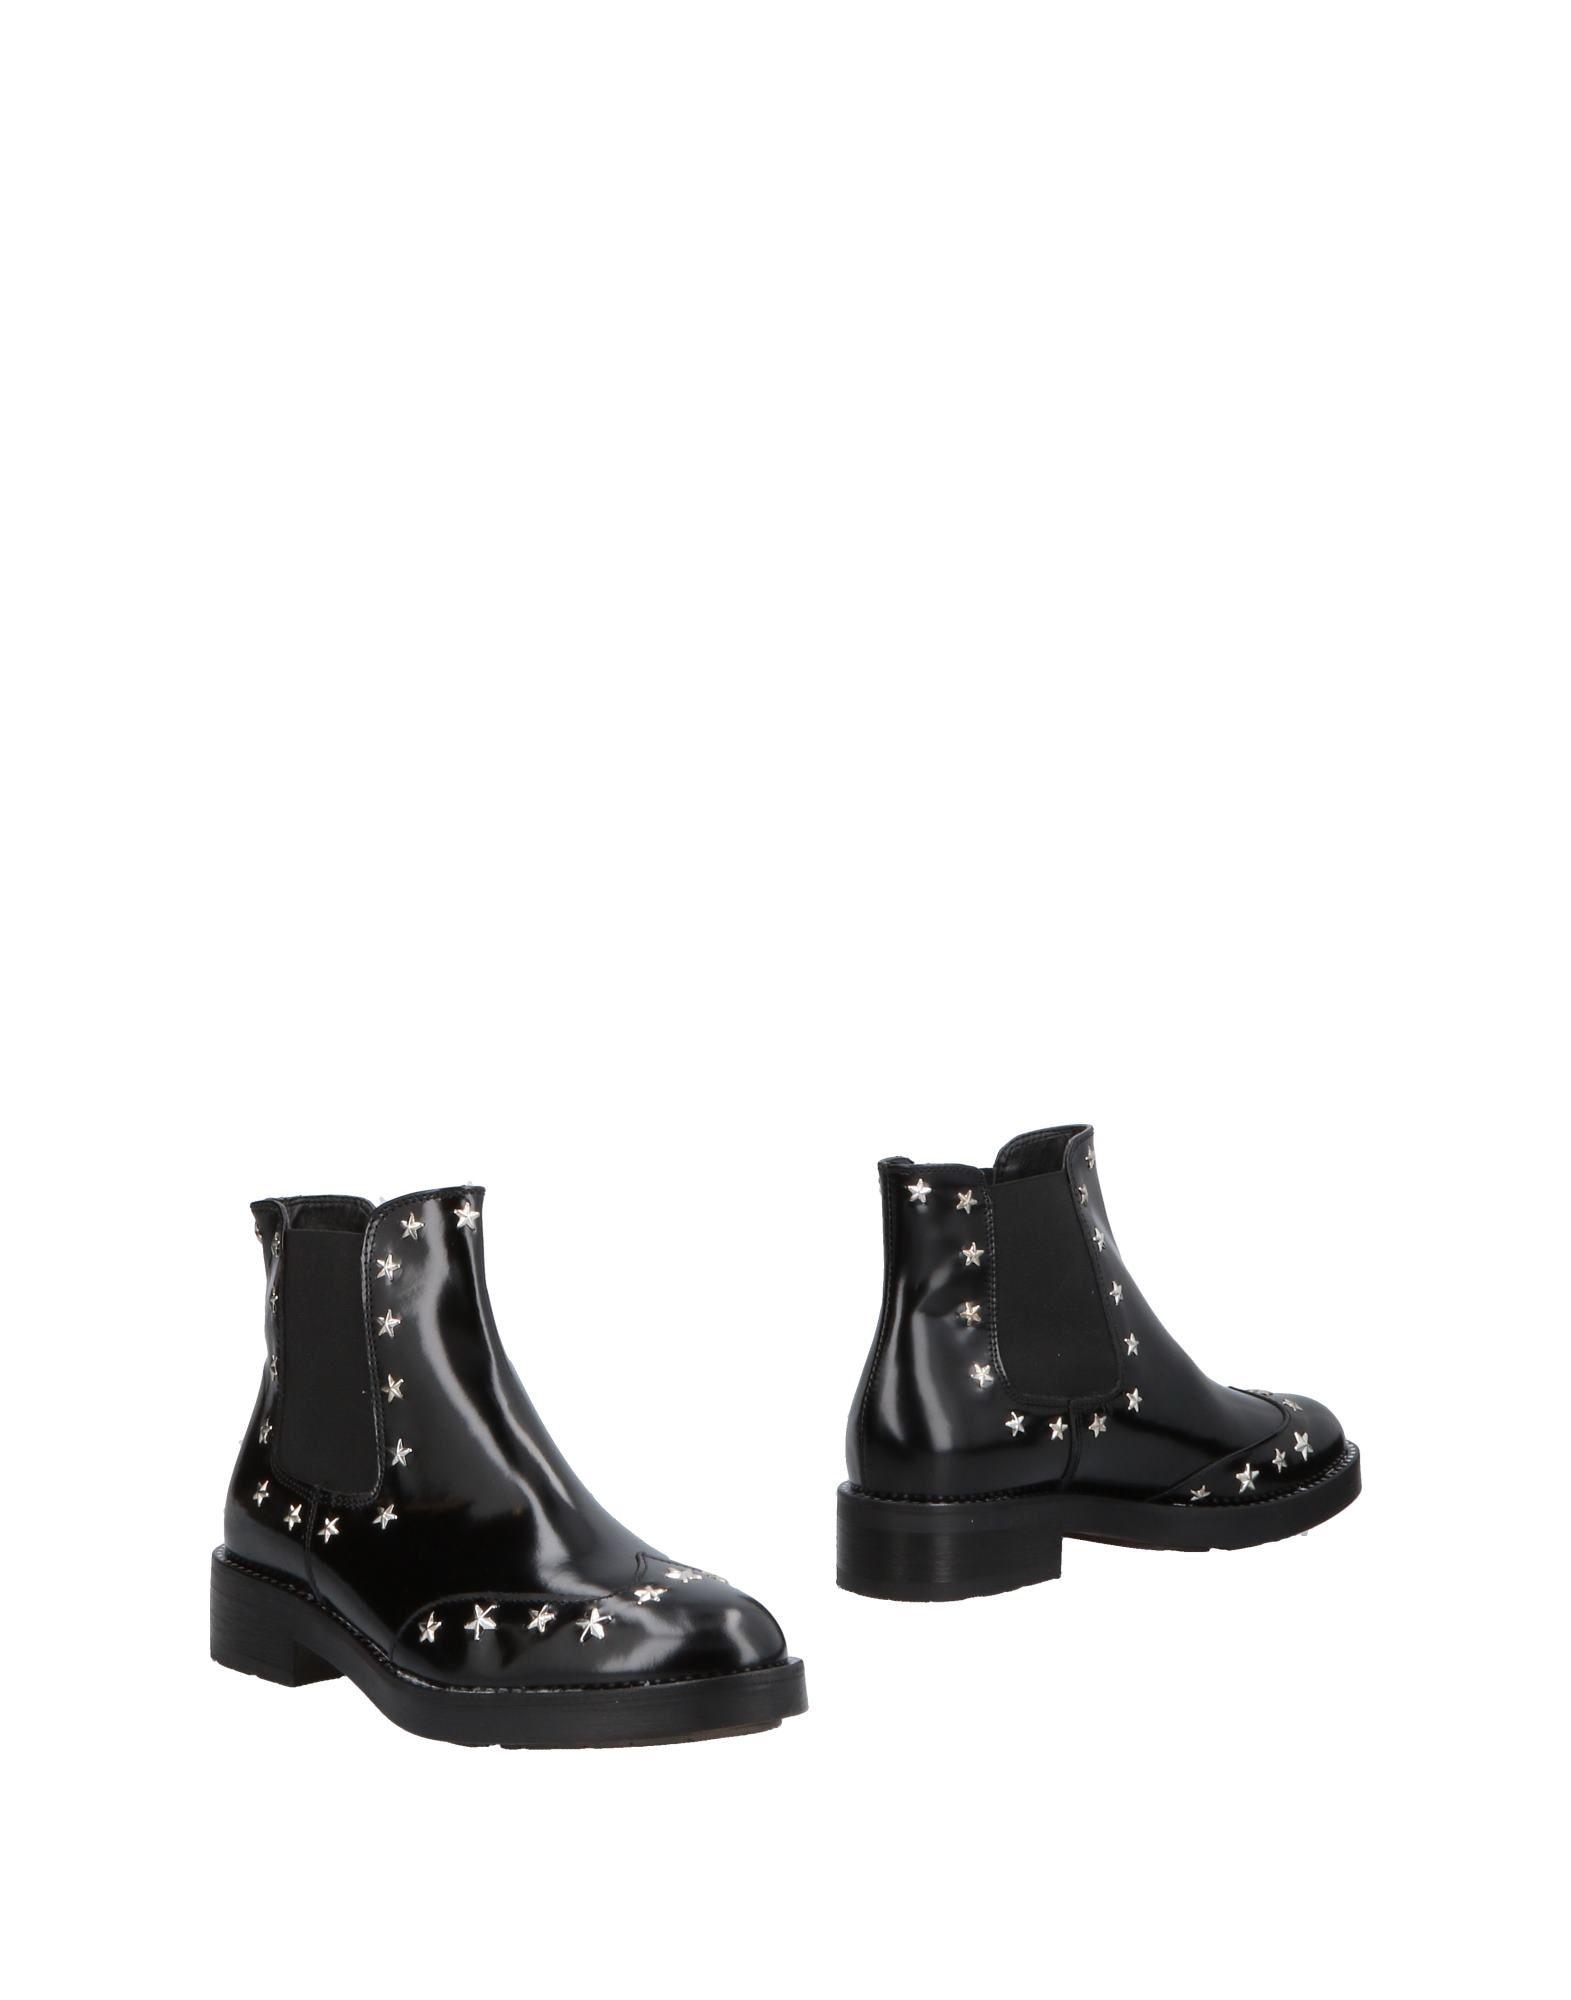 Stilvolle billige Schuhe Loretta  By Loretta Chelsea Boots Damen  Loretta 11506540LV 587838